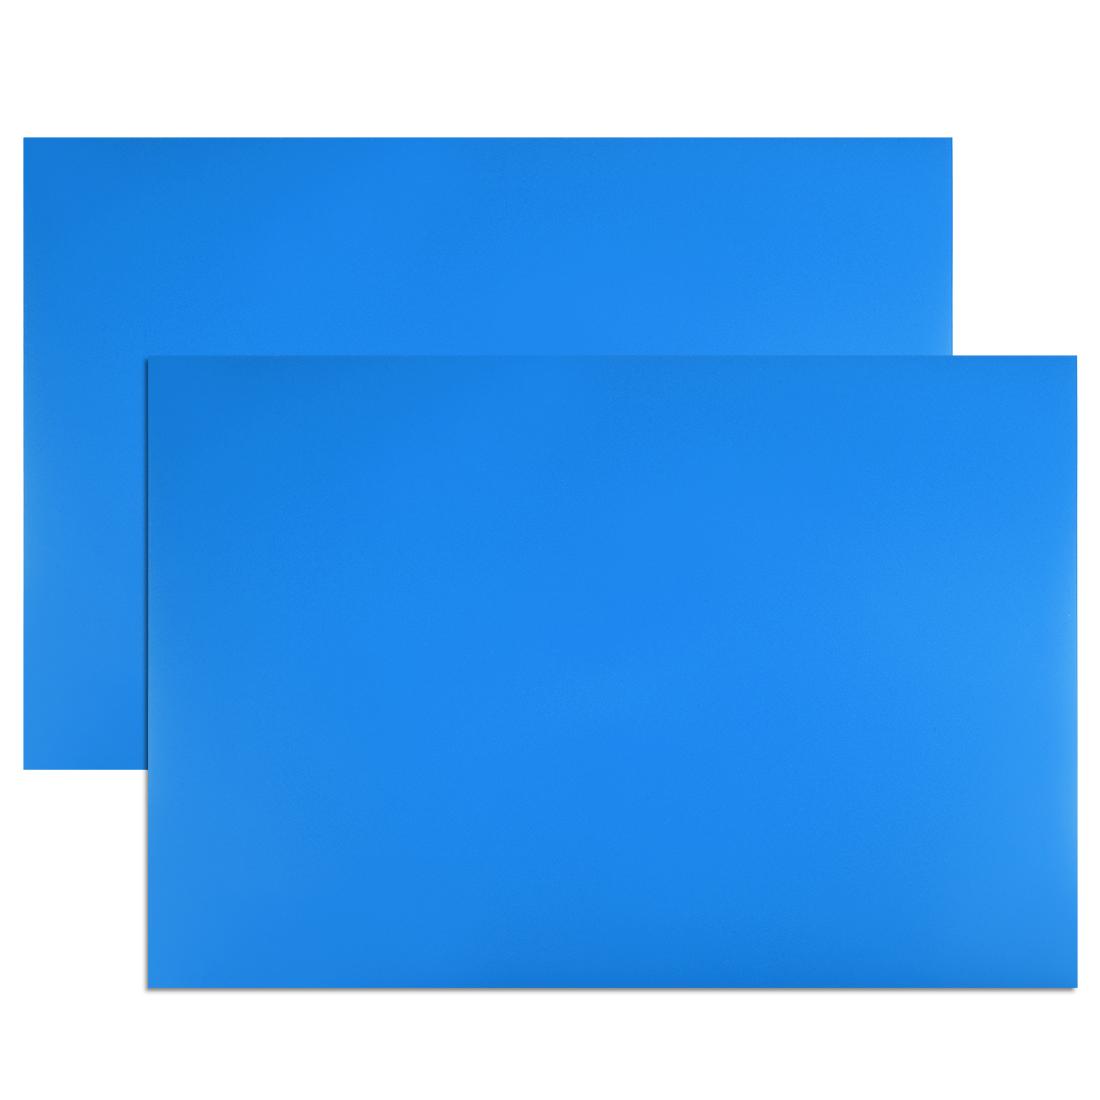 "2 Pcs Dry Erase Magnetic Strip 11.7"" x 8"" Magnetical Sheet Blue"